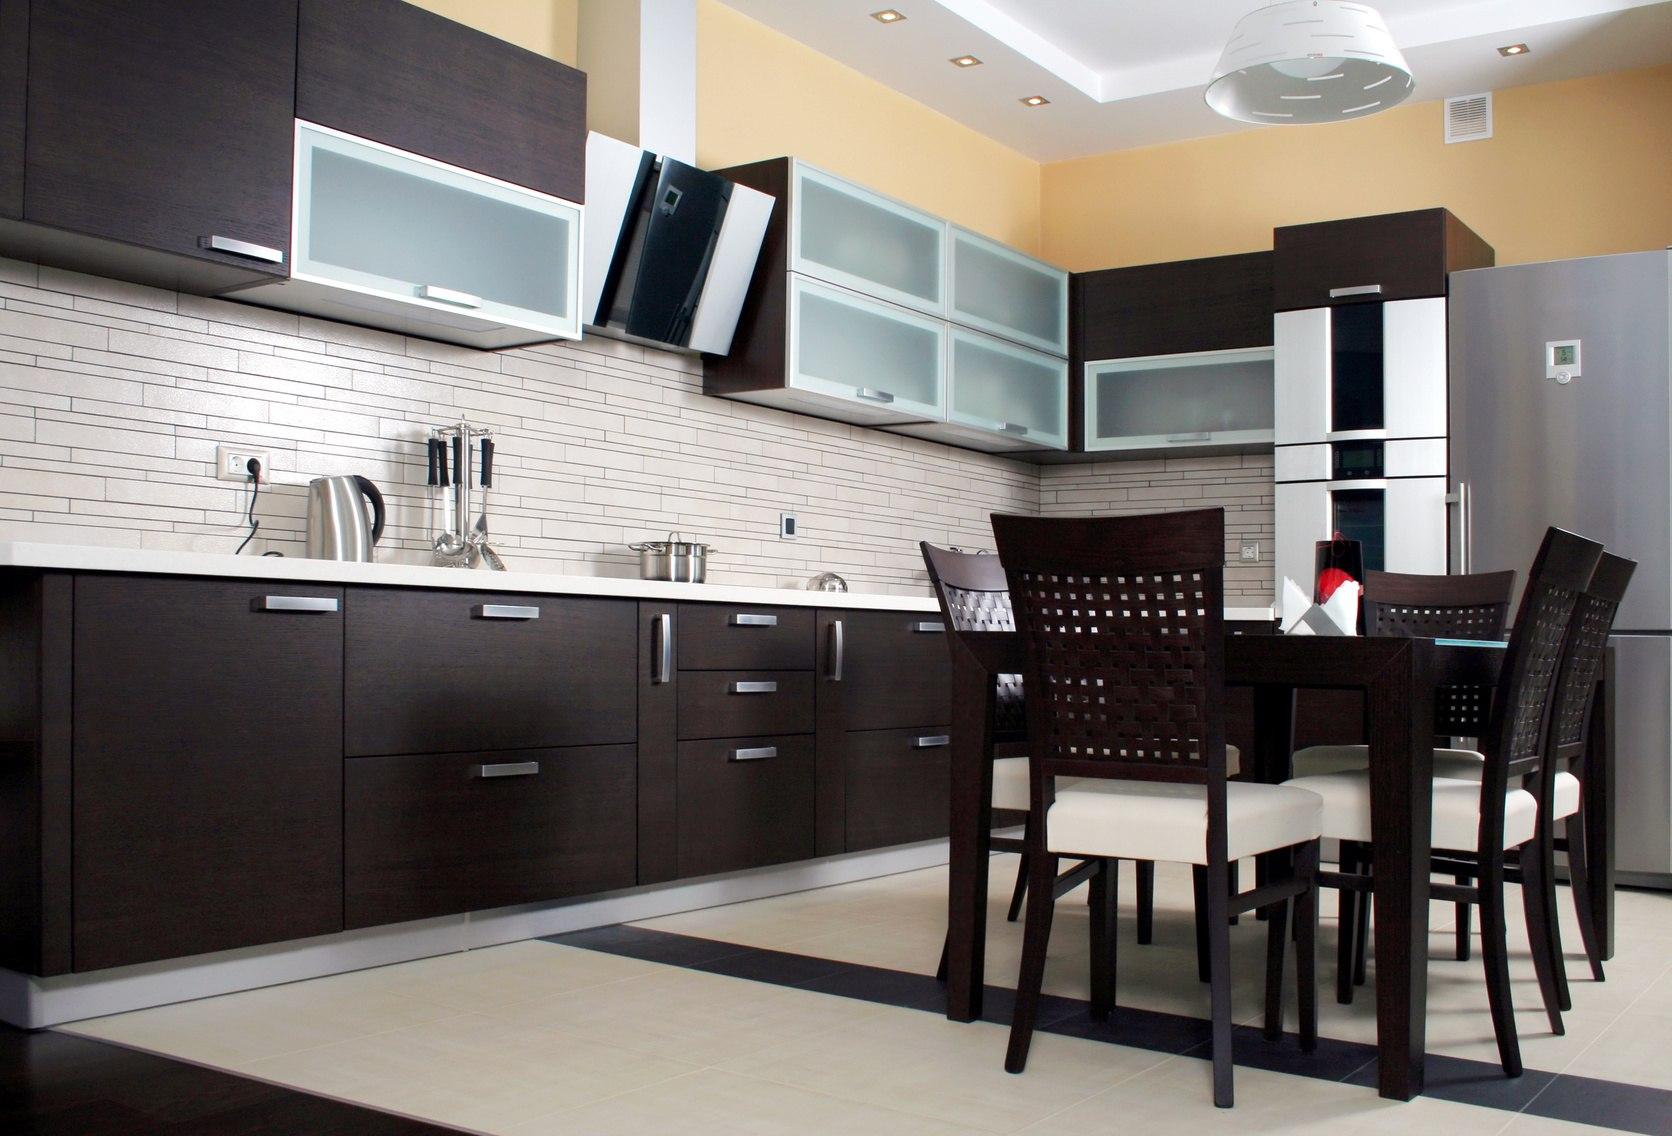 Картинки коричневой кухни